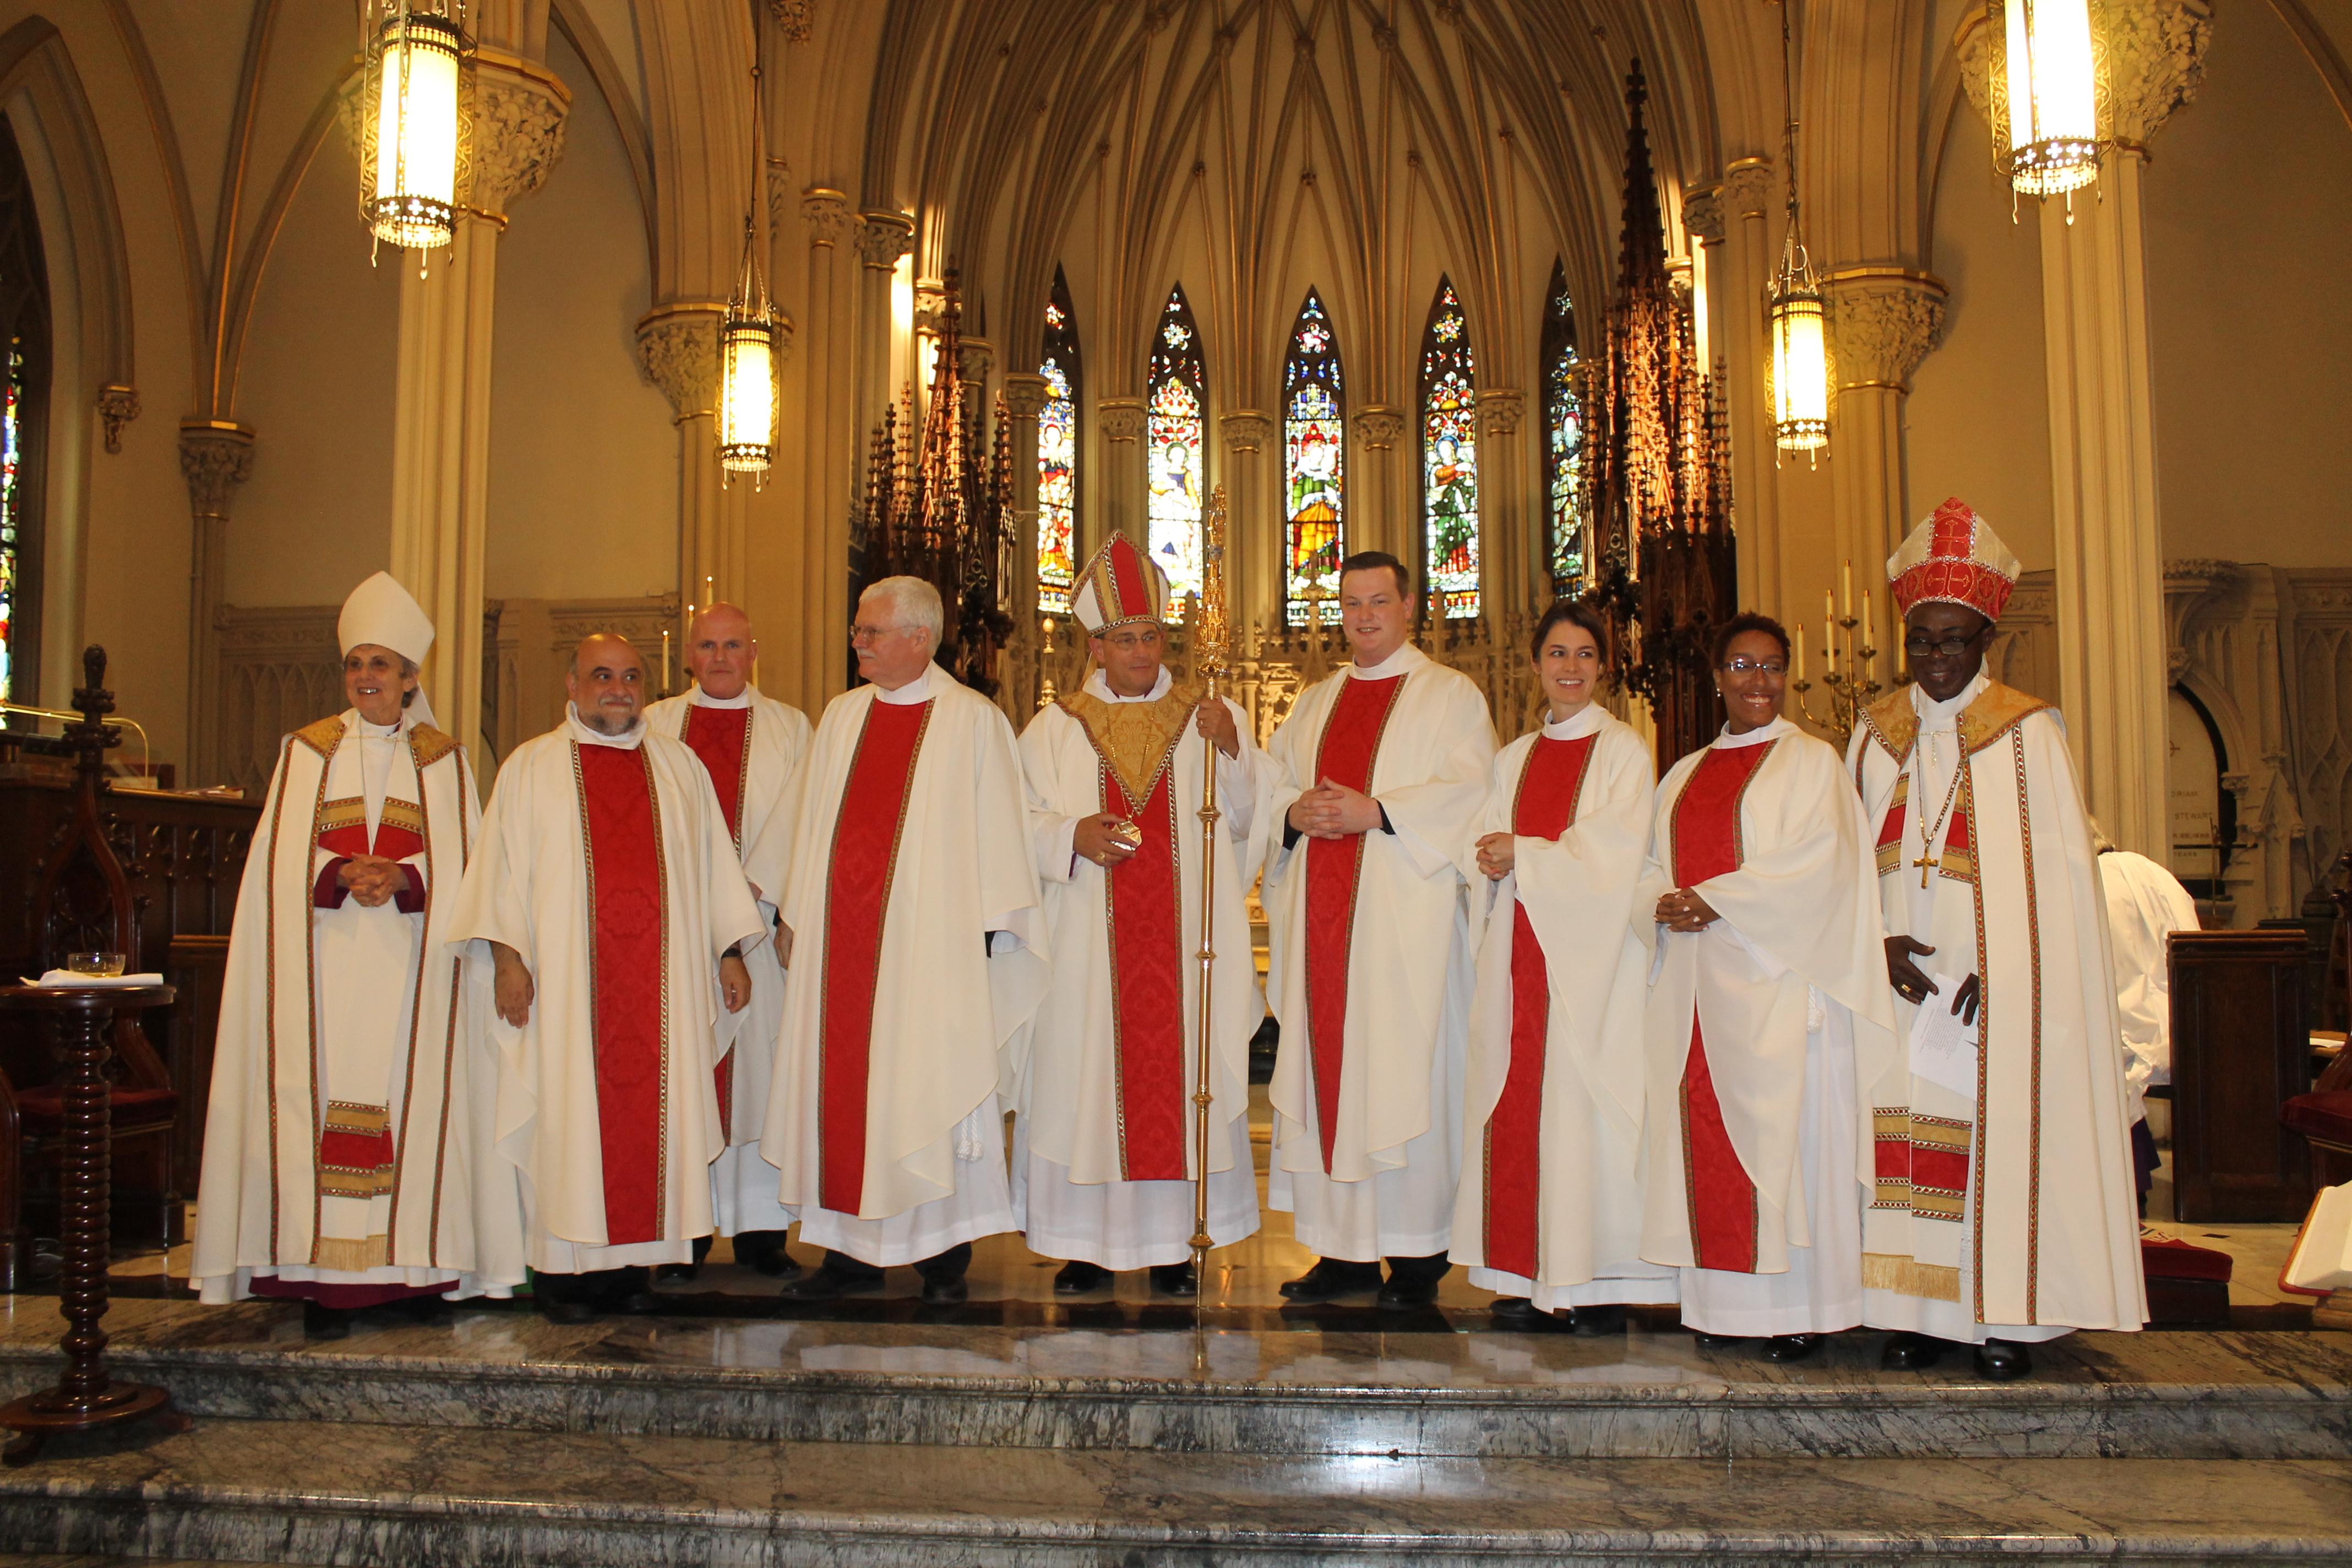 OrdinationRevPaulineSamuel/Ordination48.JPG